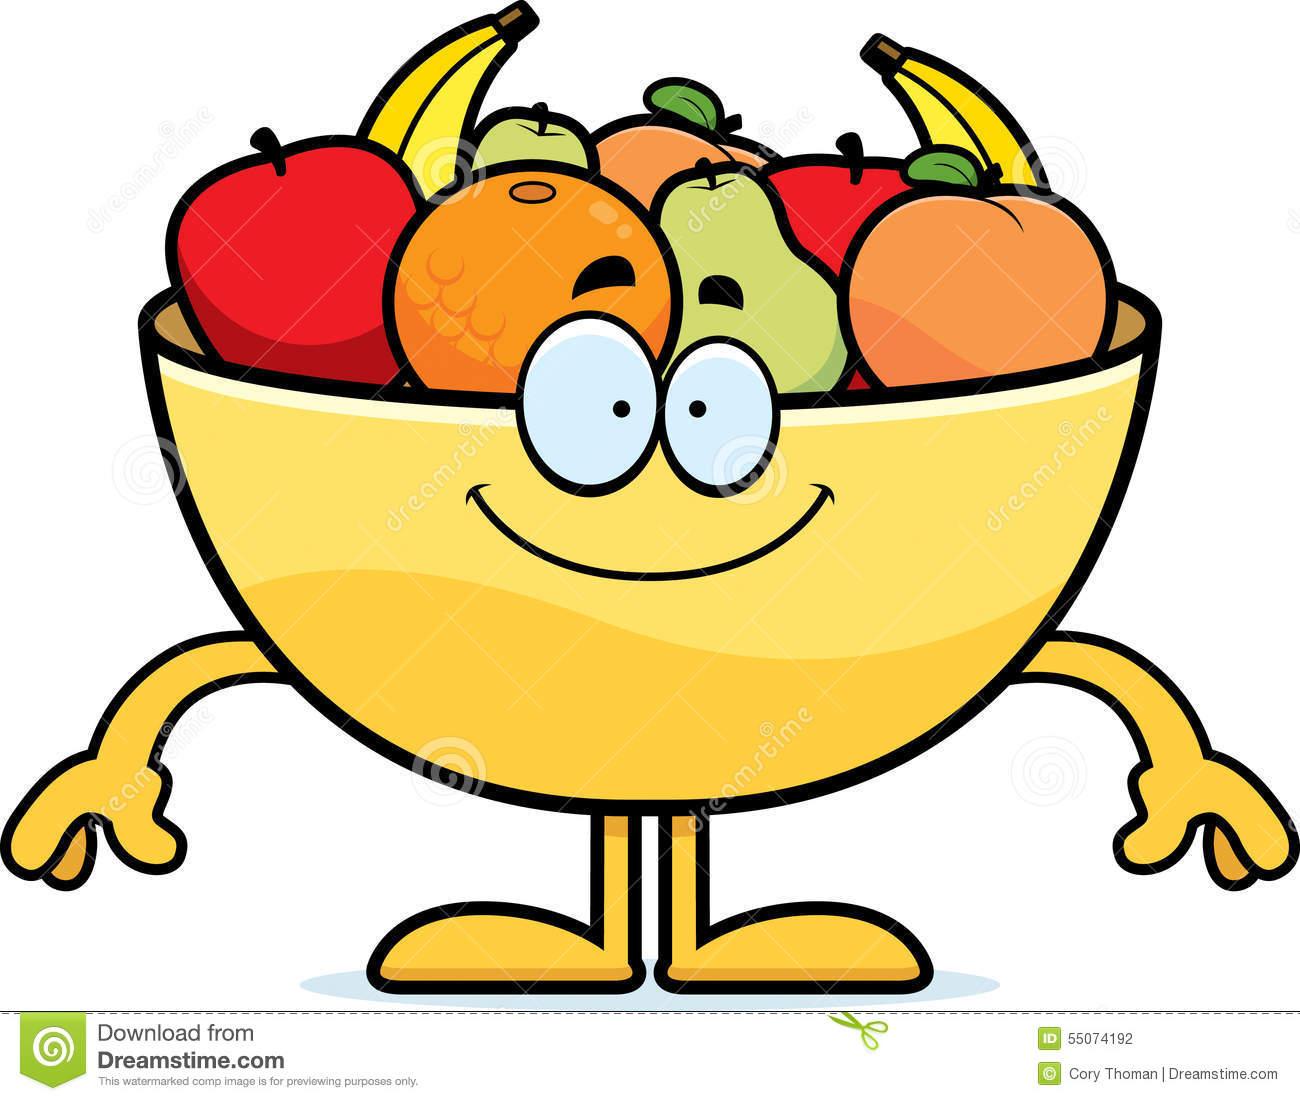 Fruit happy illustration looking. Bowl clipart cartoon